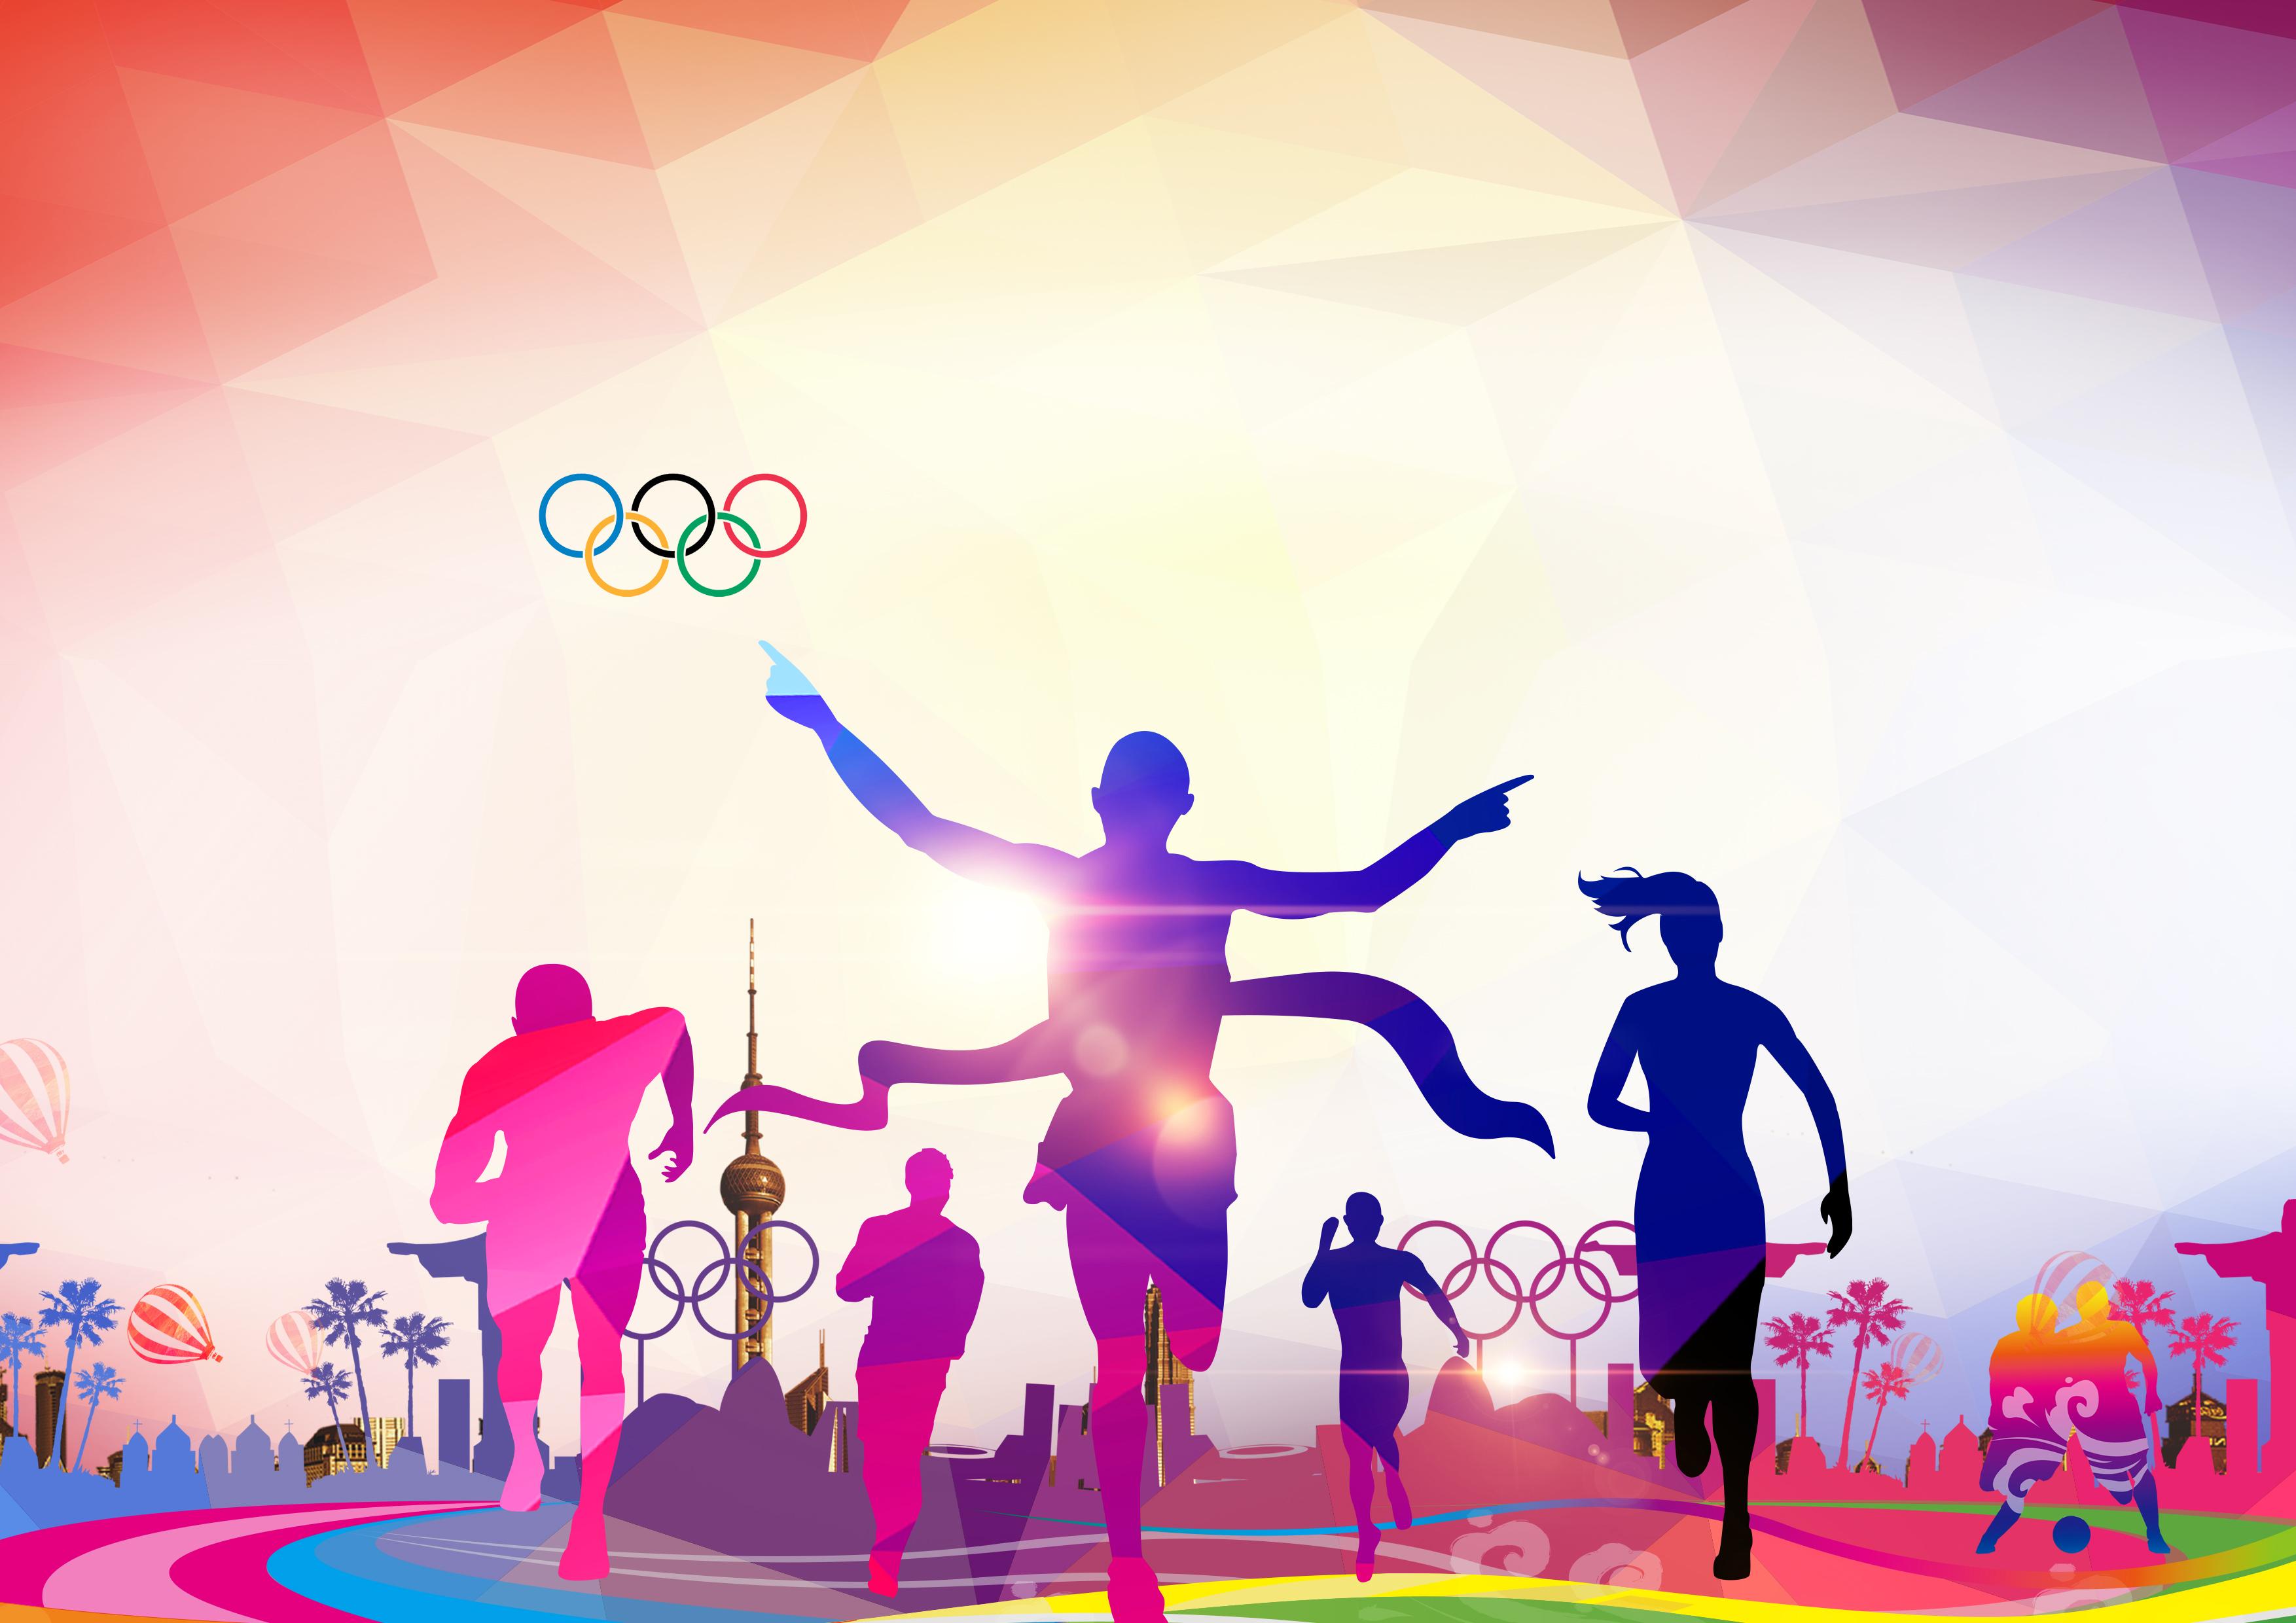 people running sports background crowd run movement